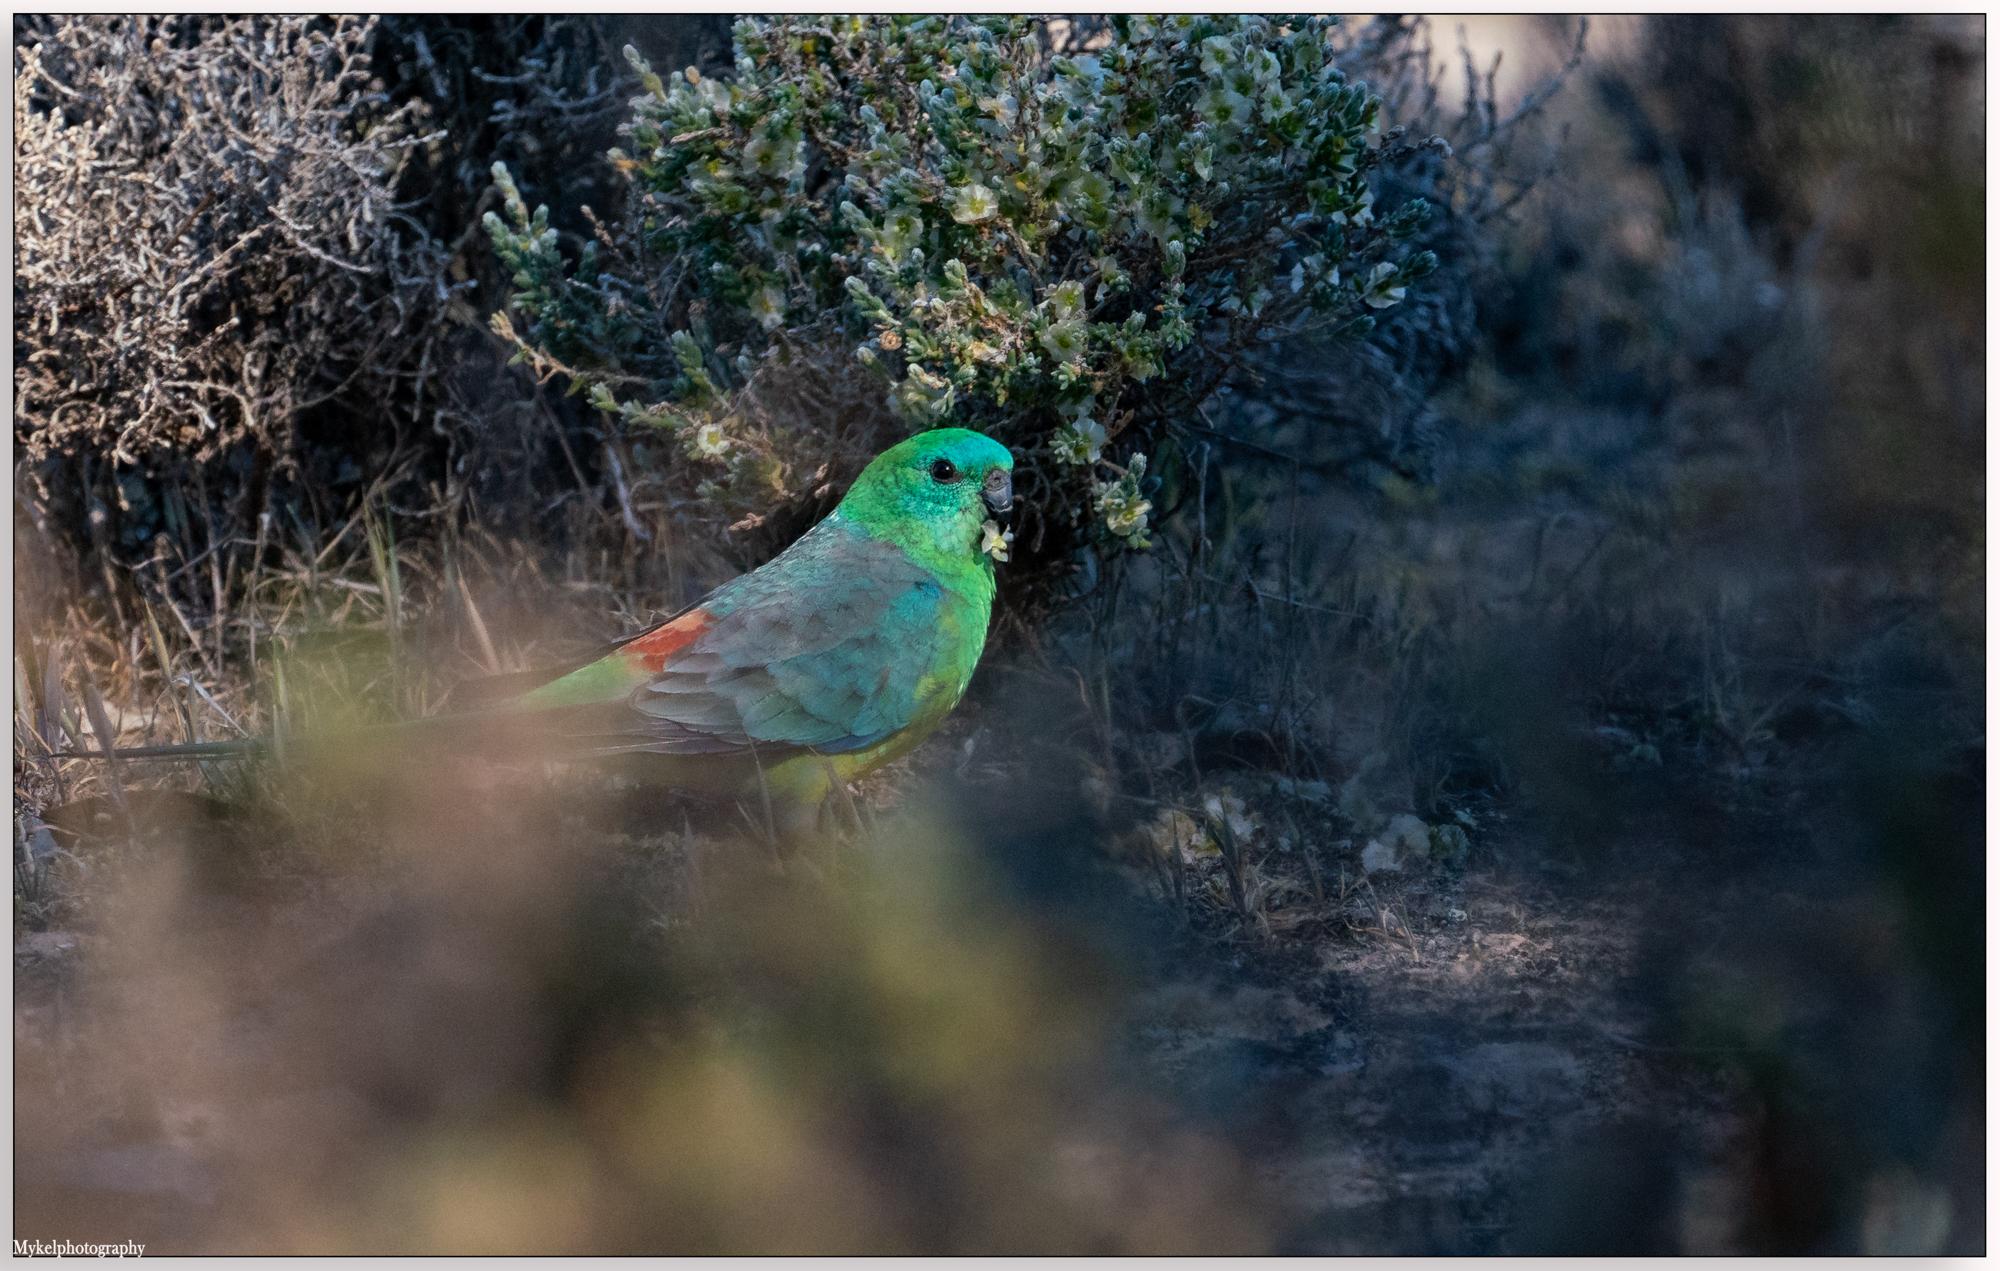 Red-rumped Parrot Psephotus haematonotus Psittacidae